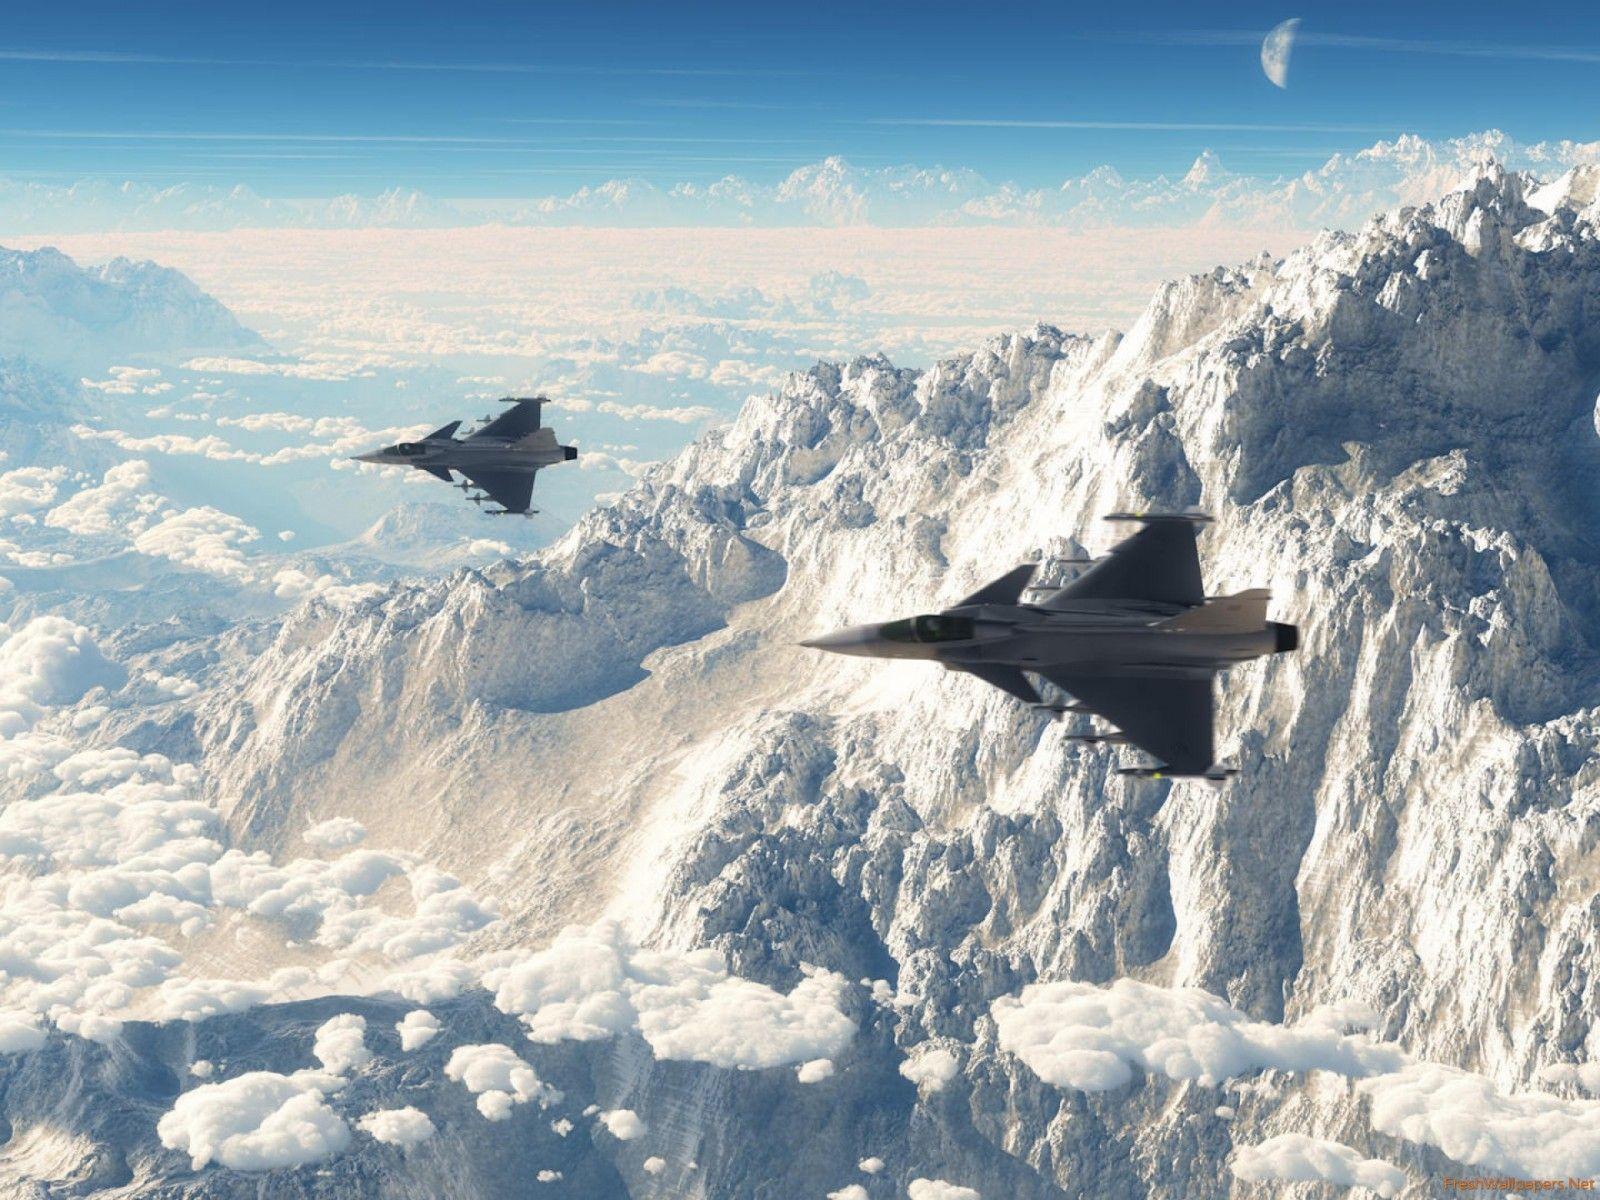 Dassault Rafale Wallpapers Wallpaper Cave